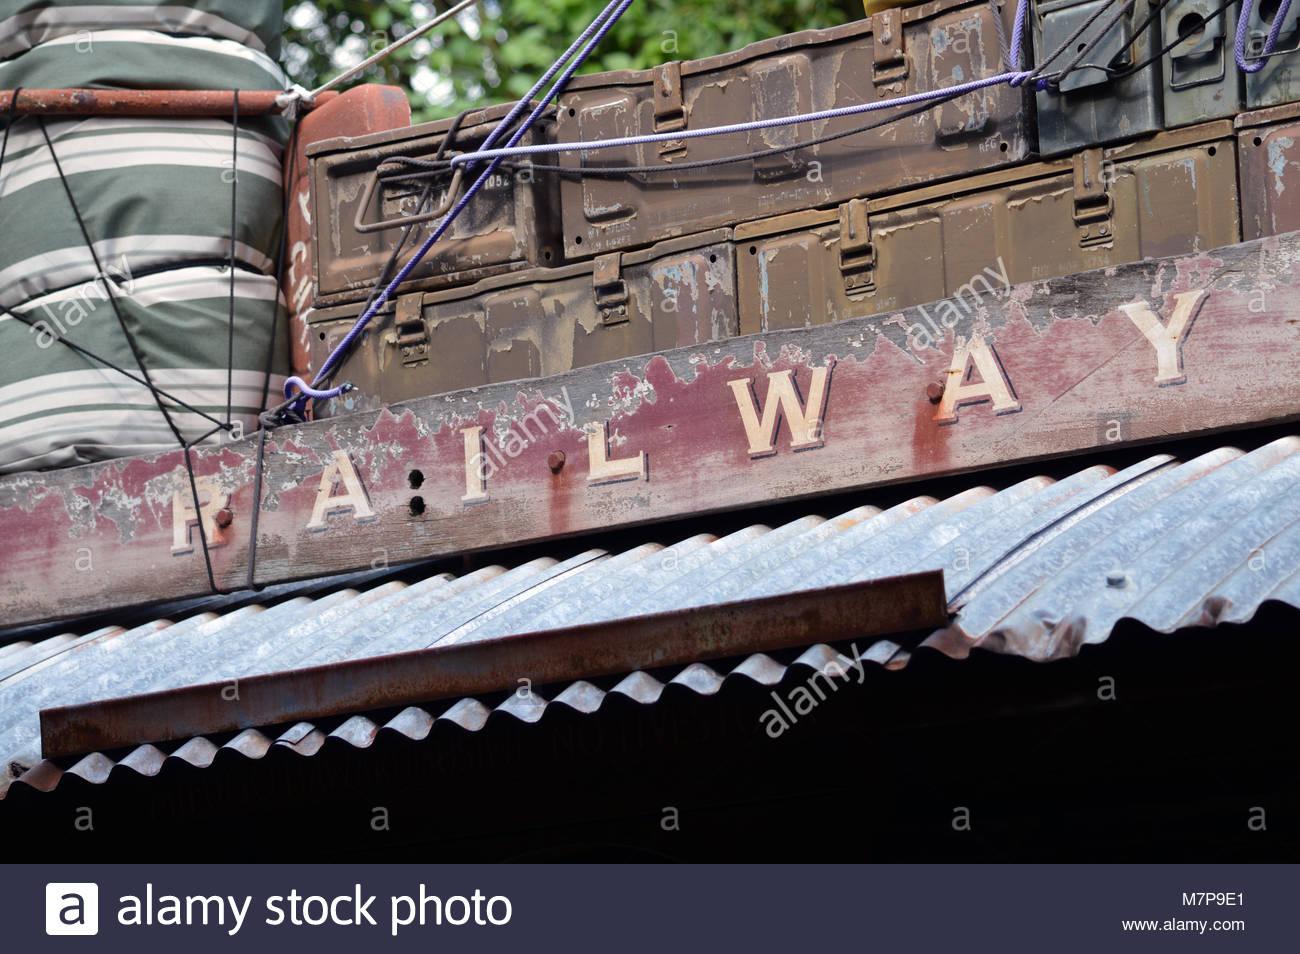 Railway Carriage Sign Stock Photos Amp Railway Carriage Sign